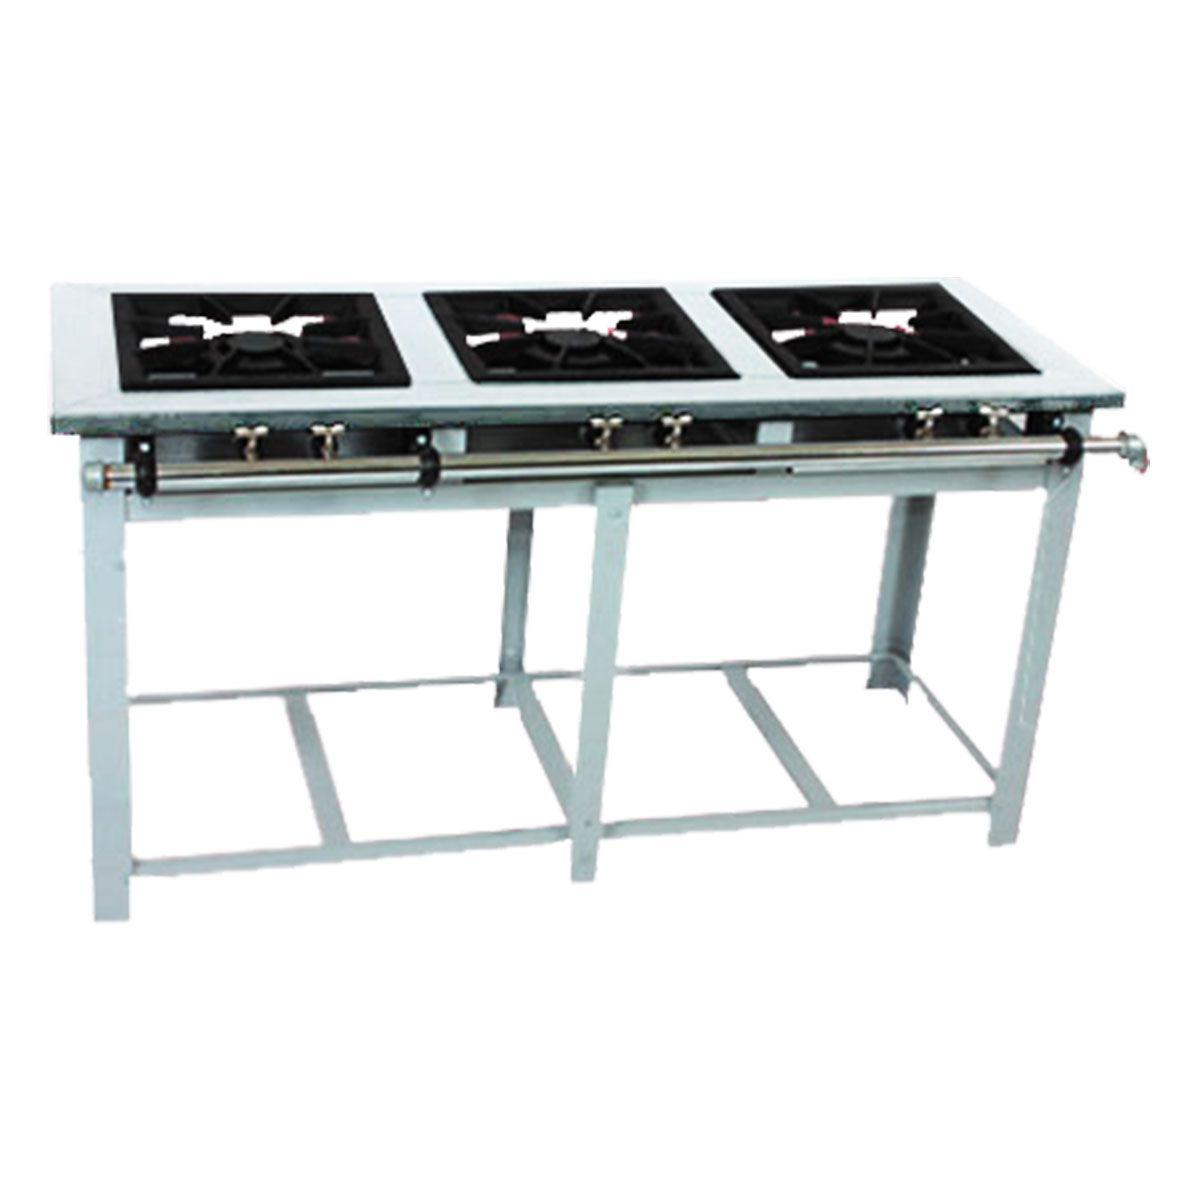 Fogão Industrial 3 Bocas 40X40 Baixa Pressão Maxi Inox Mi3 - Venâncio